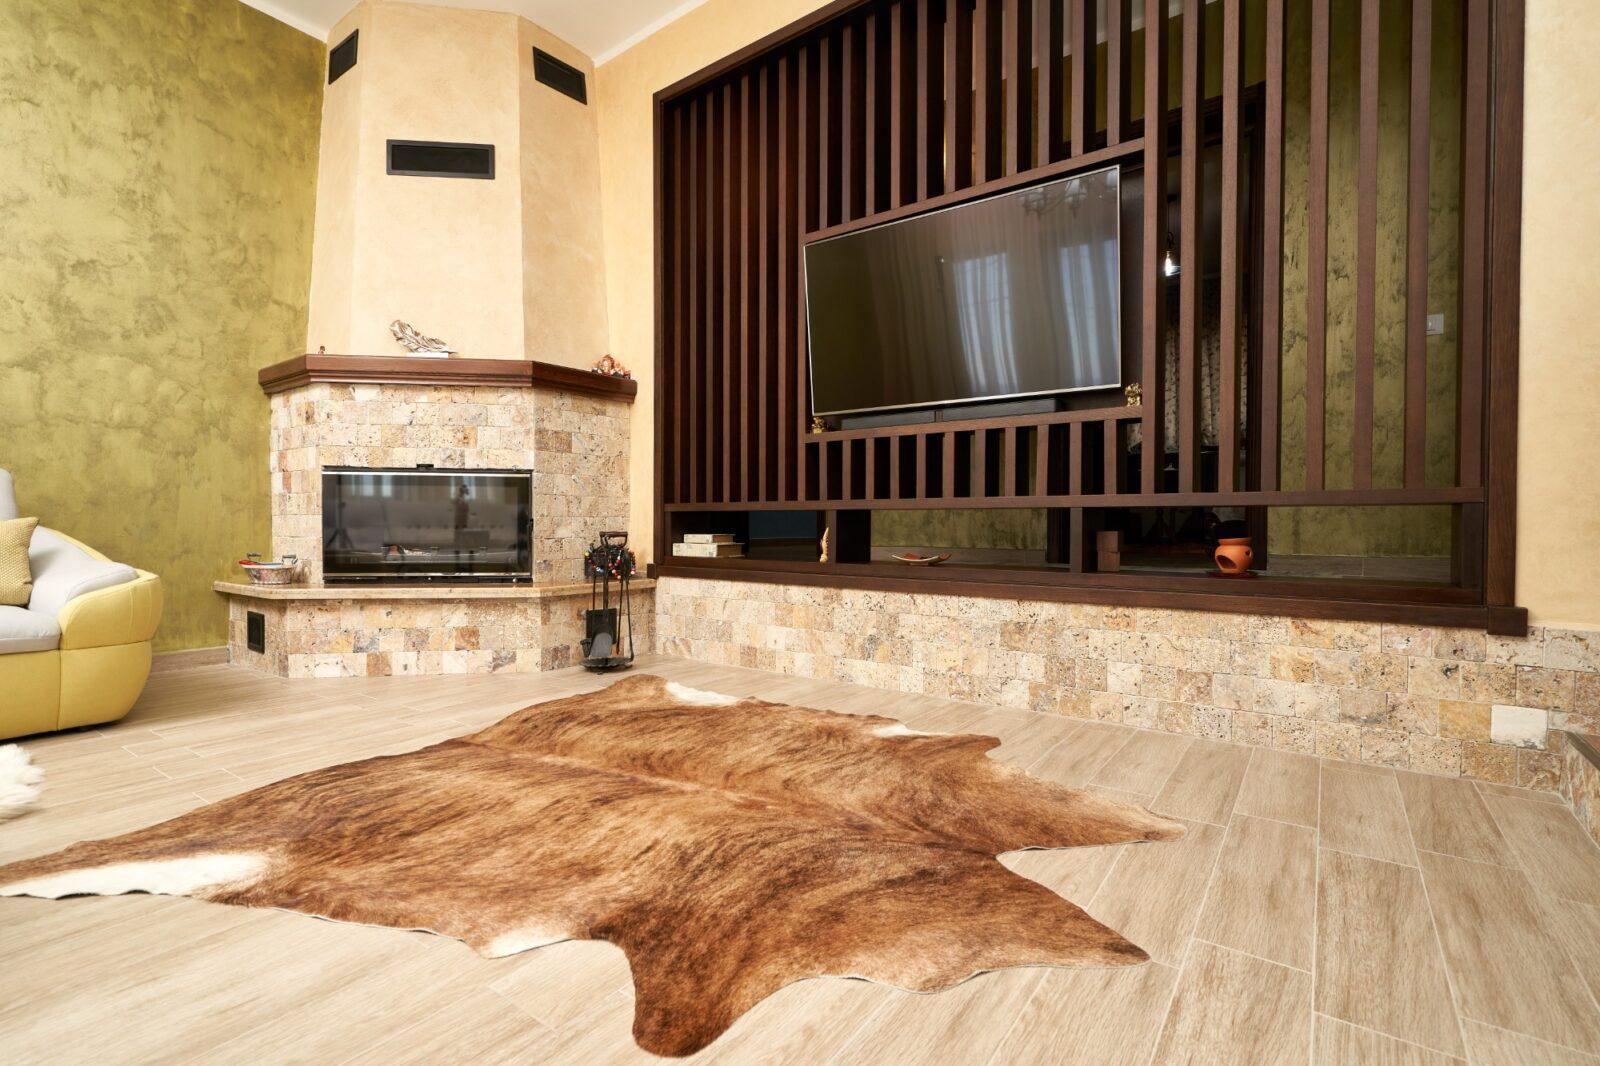 perete decorativ lemn